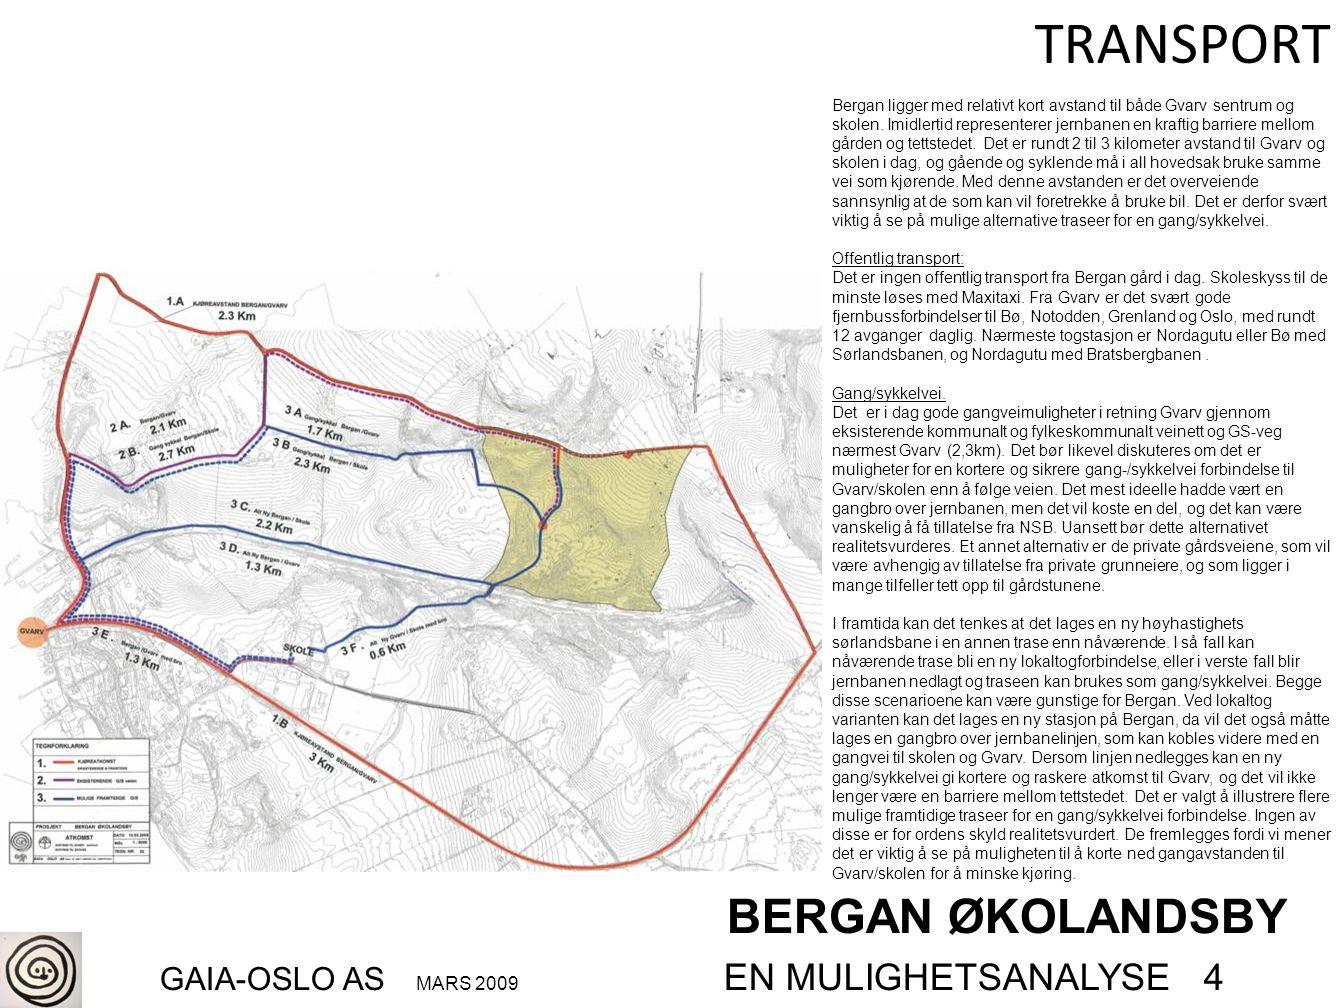 BERGAN ØKOLANDSBY GAIA-OSLO AS MARS 2009 EN MULIGHETSANALYSE 4